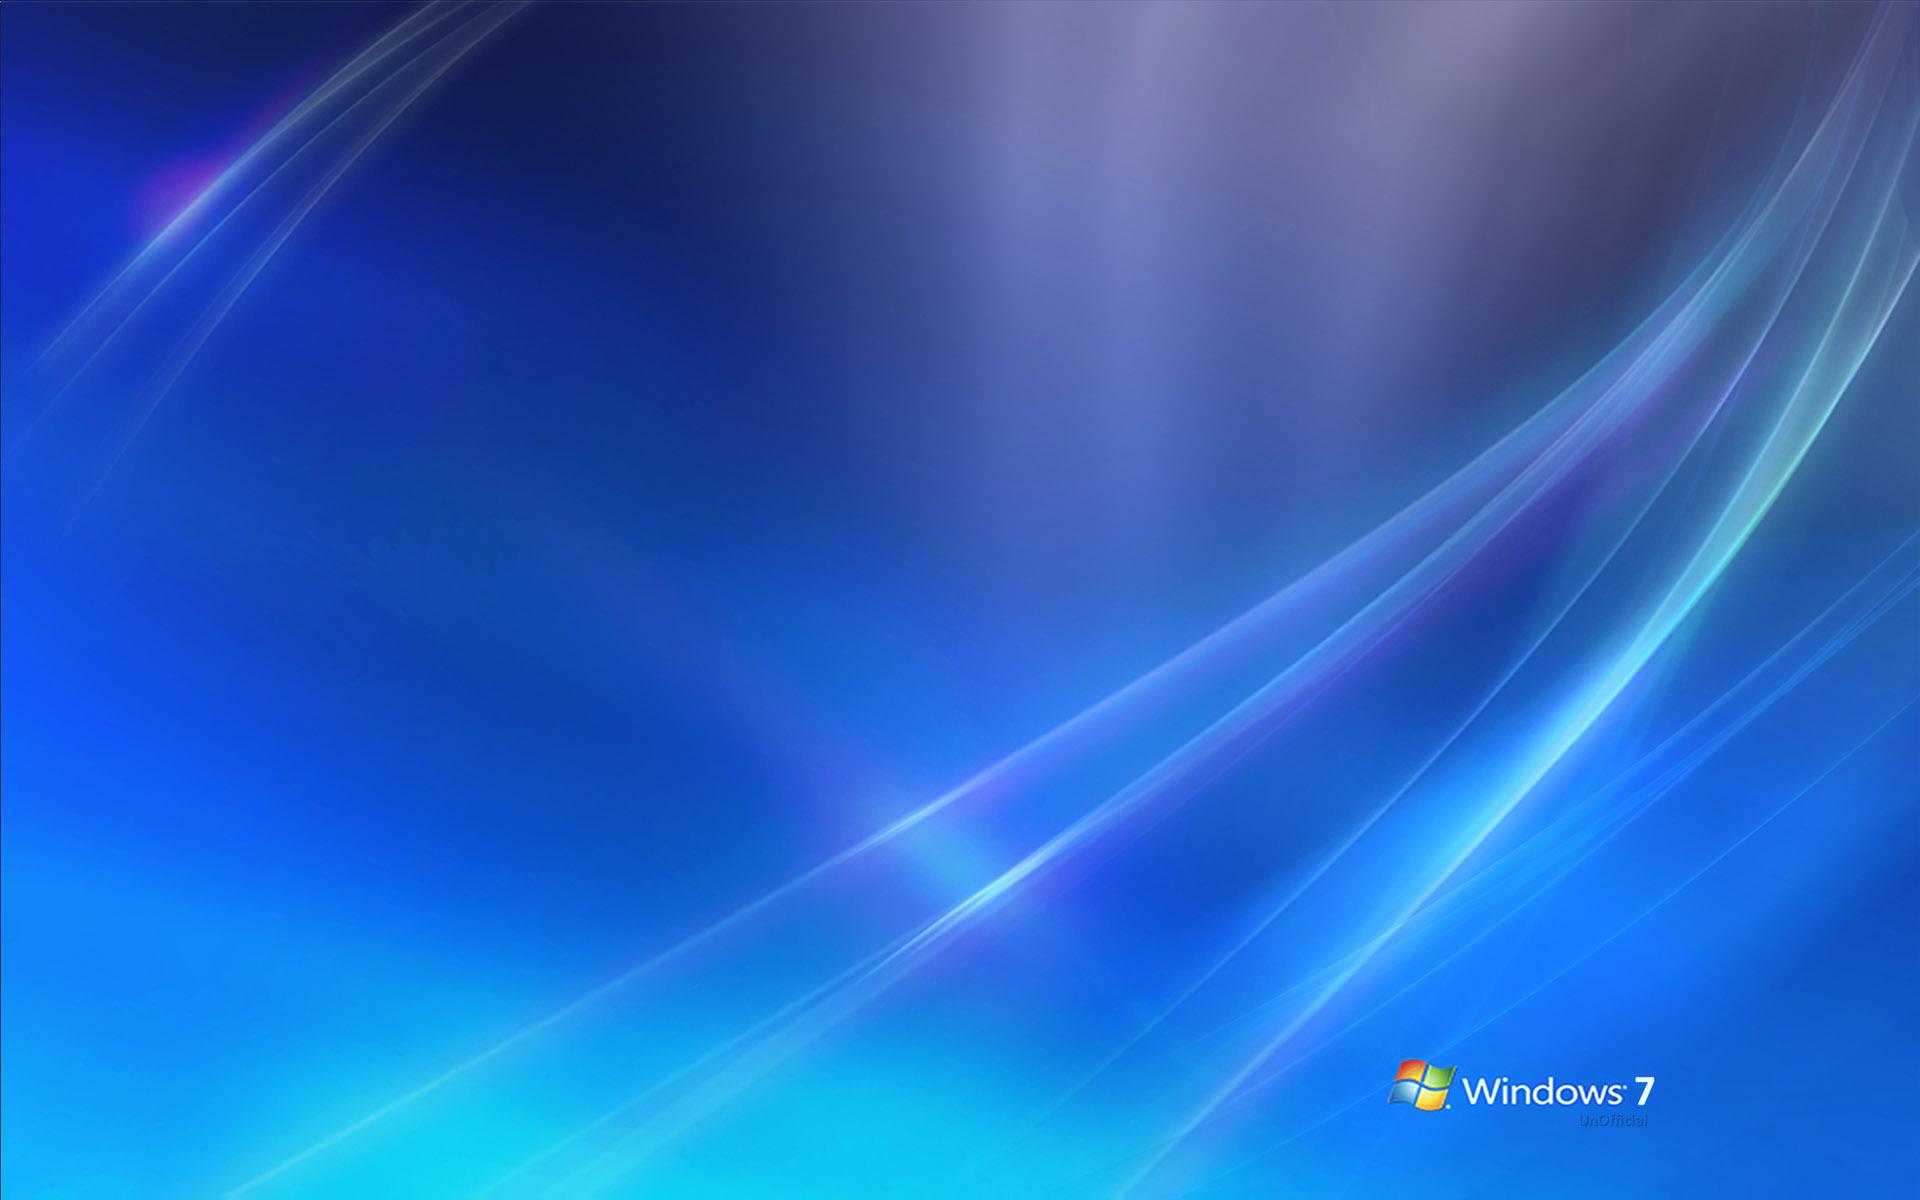 Windows 7 wallpapers - Windows 7 love wallpapers ...